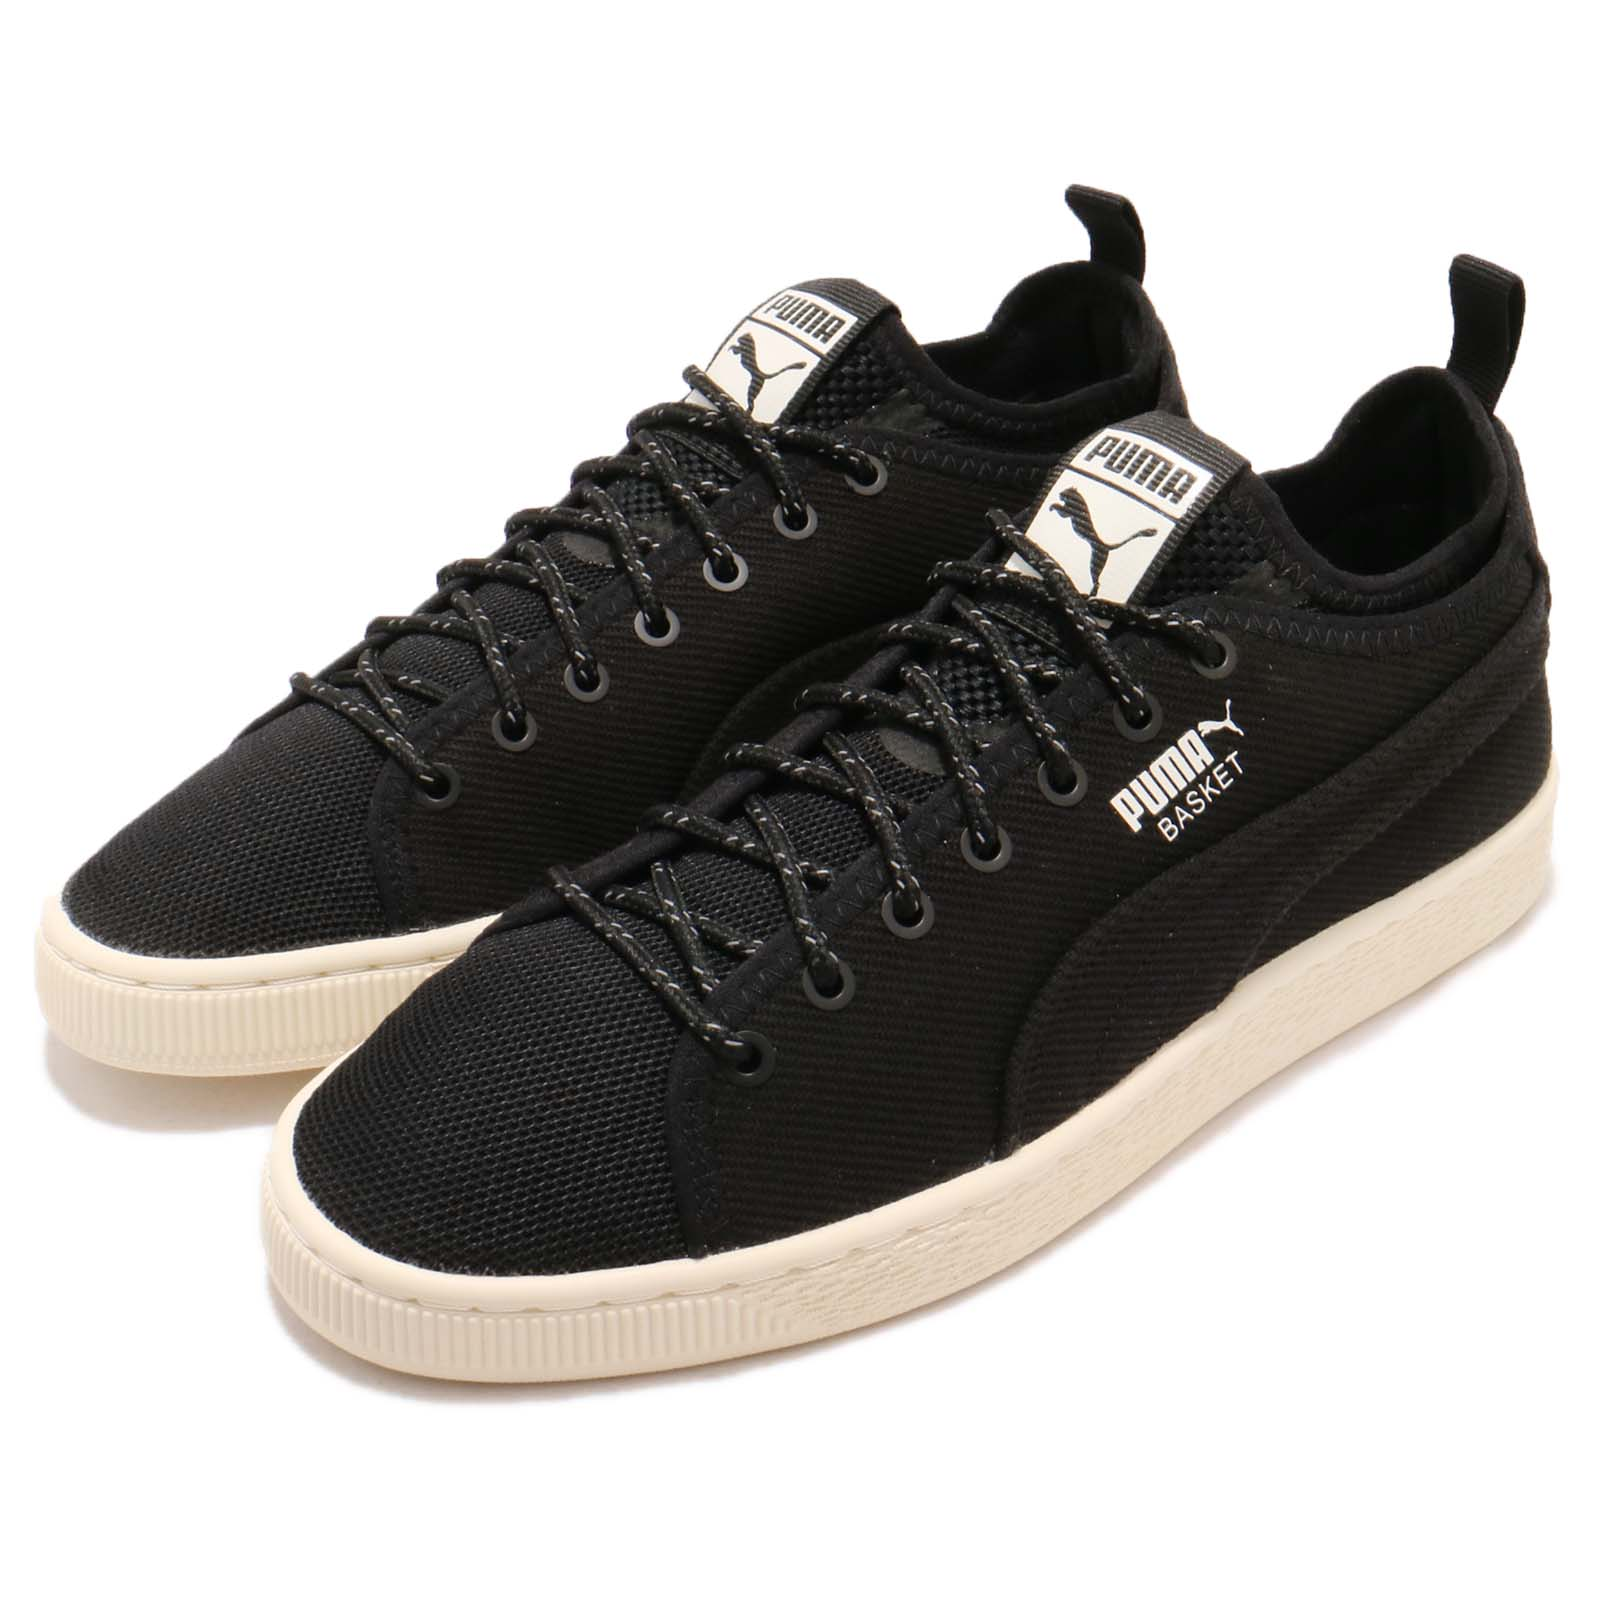 Puma 休閒鞋 Basket Classic 男鞋 女鞋 36661401